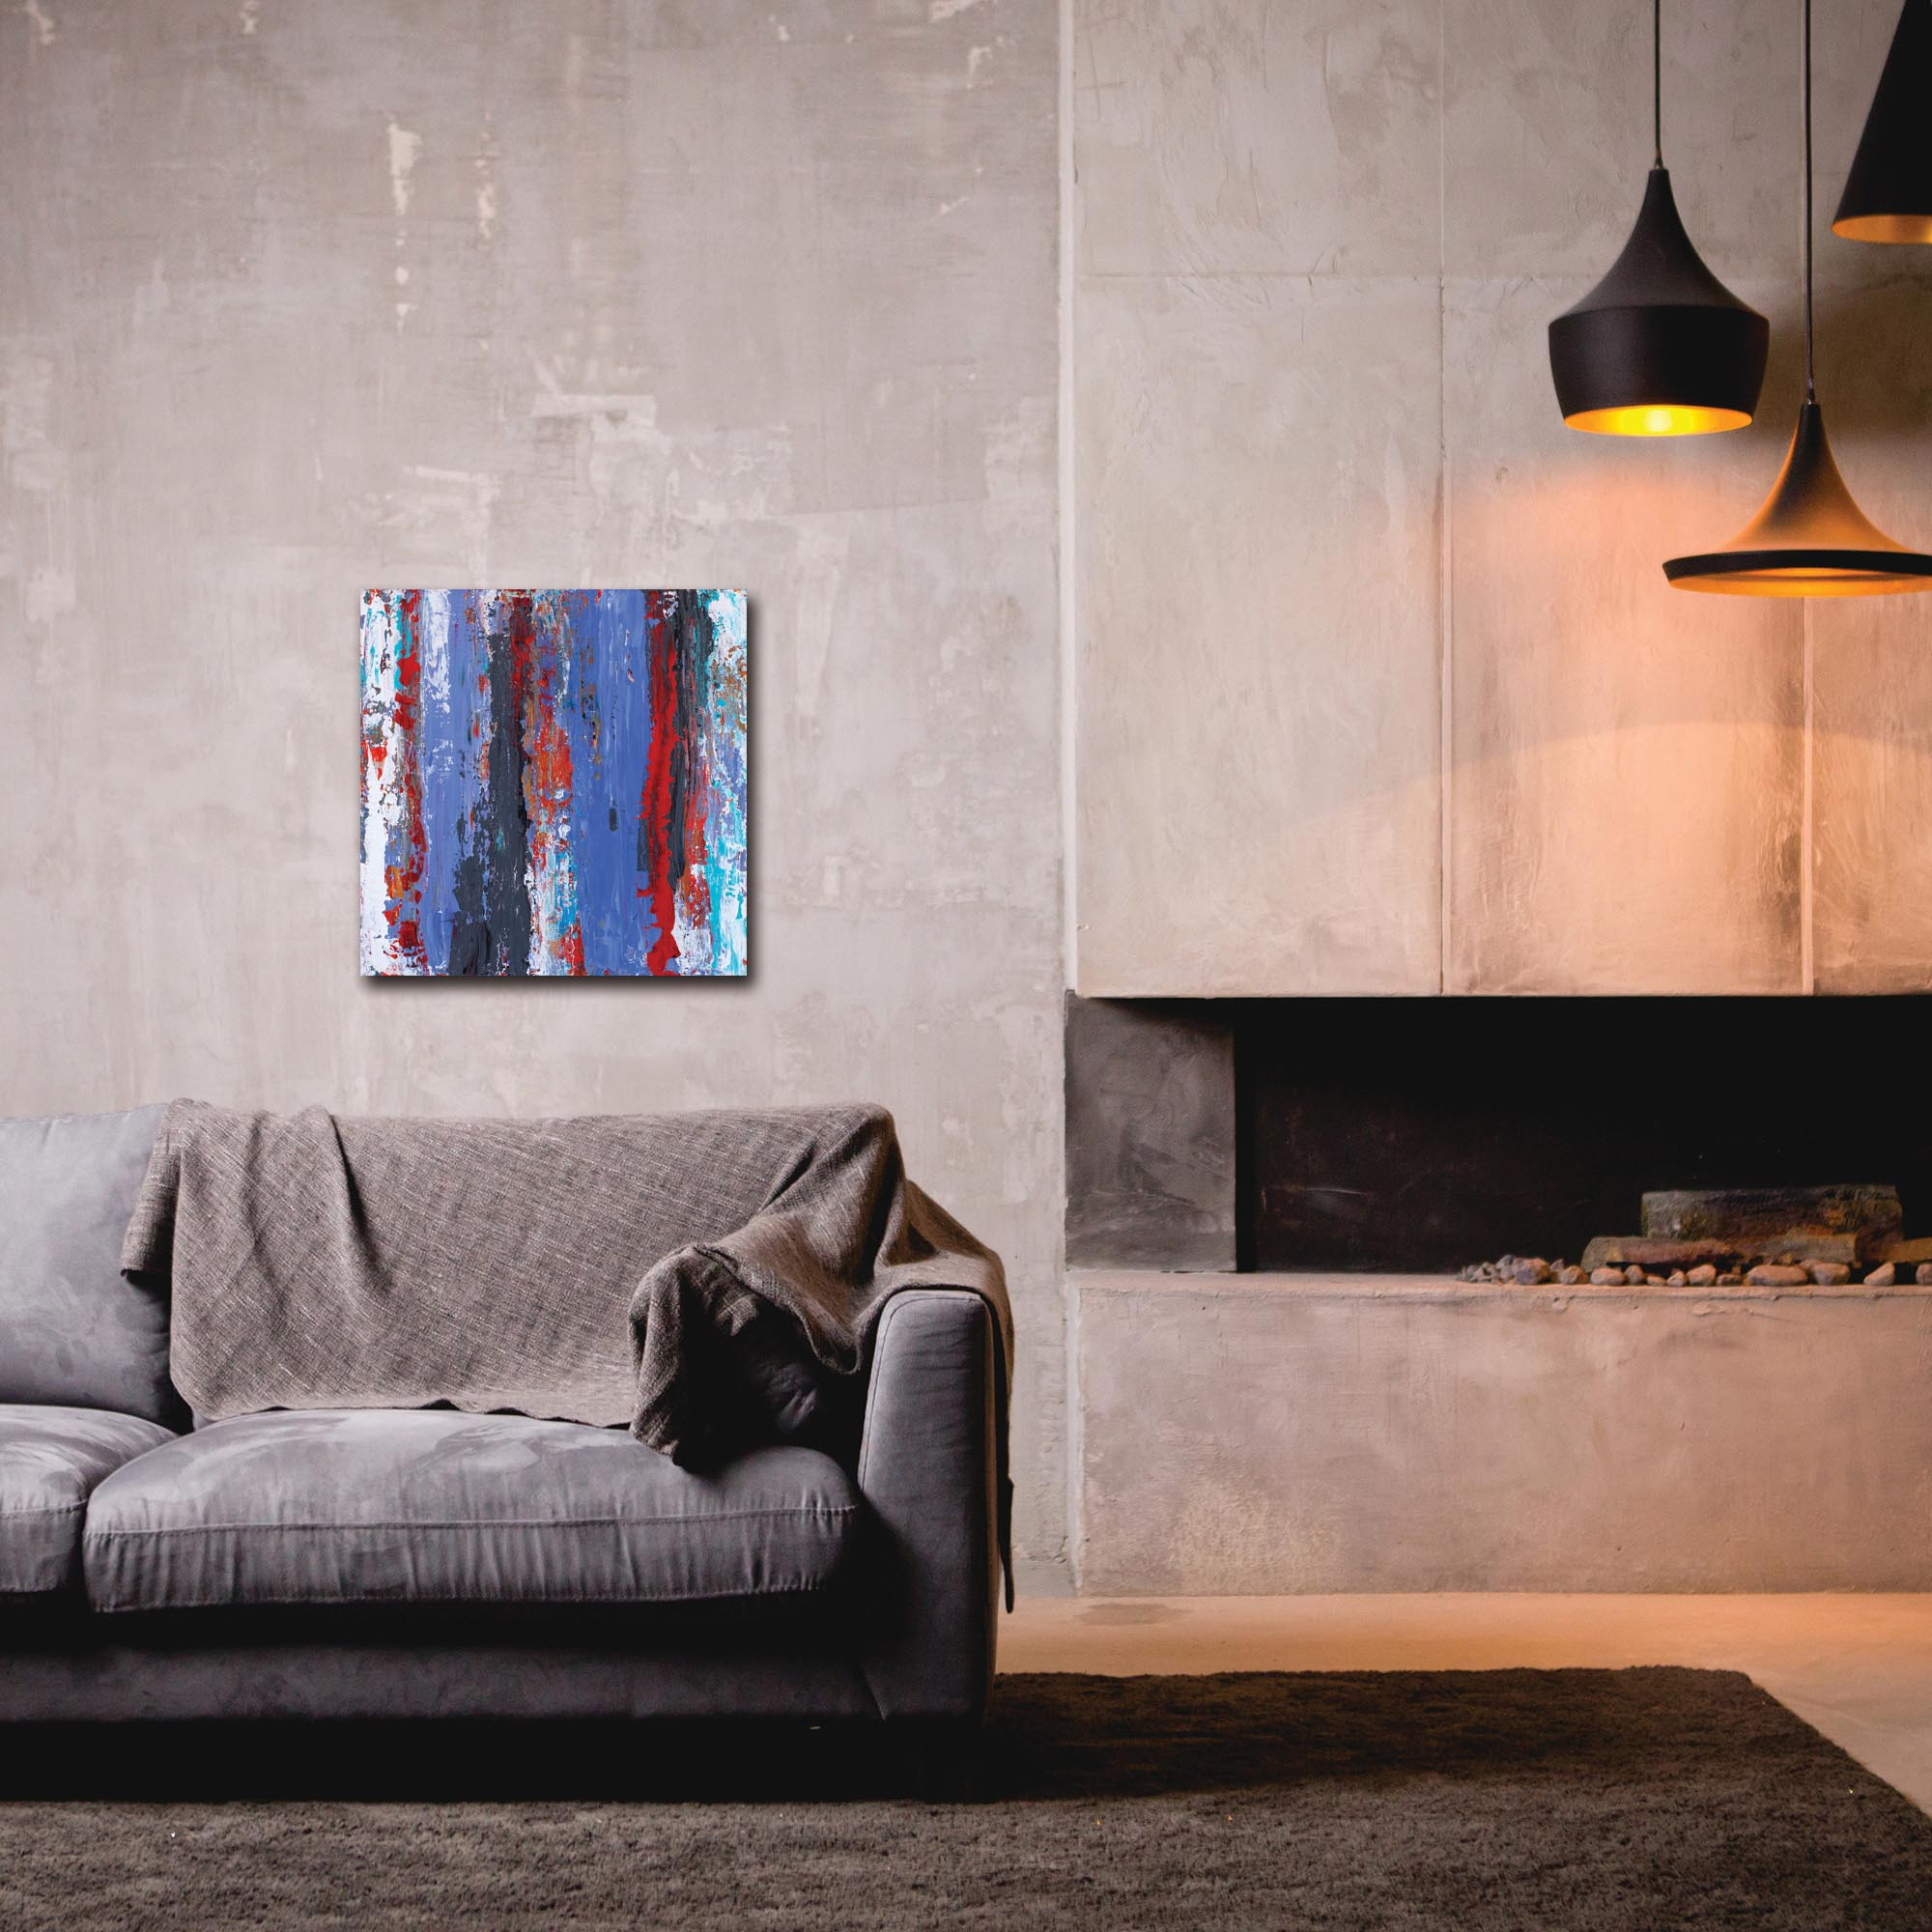 Abstract Wall Art 'Urban Life 15' - Urban Decor on Metal or Plexiglass - Lifestyle View